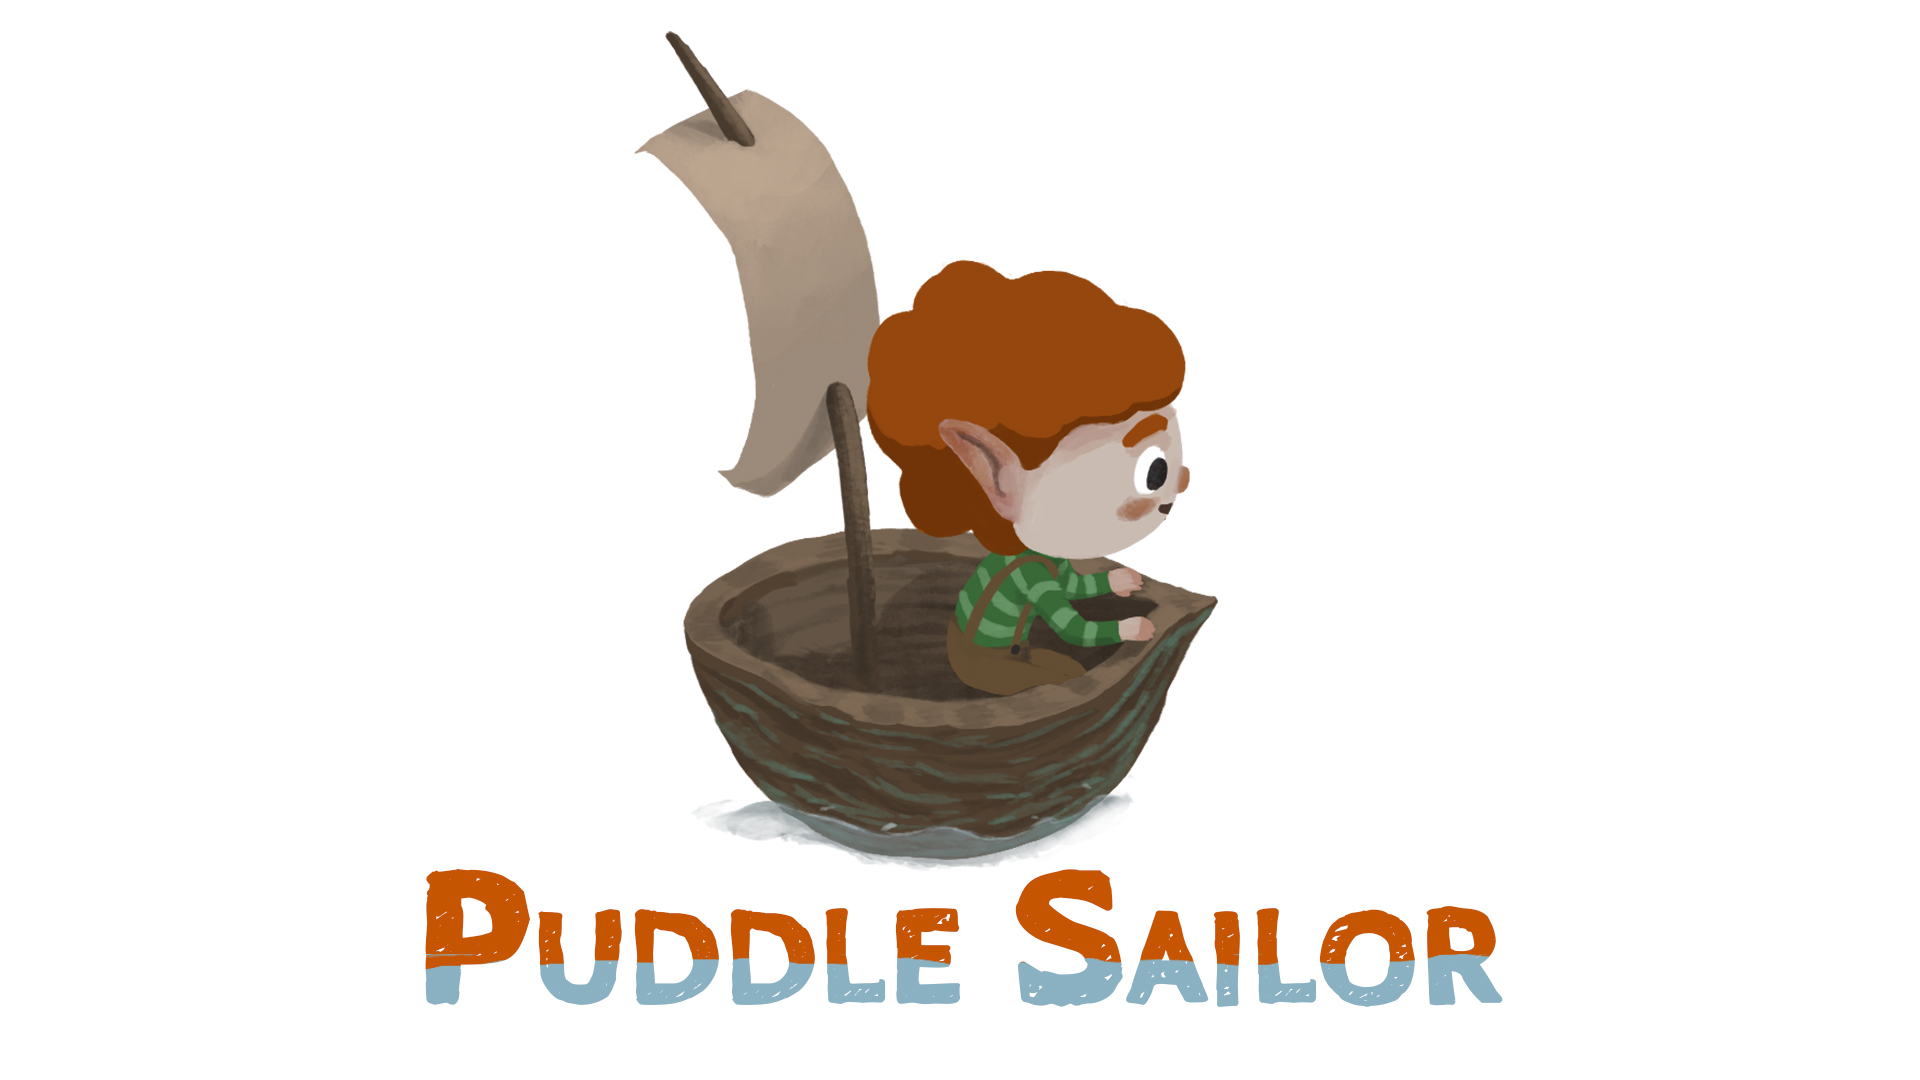 Puddle Sailor